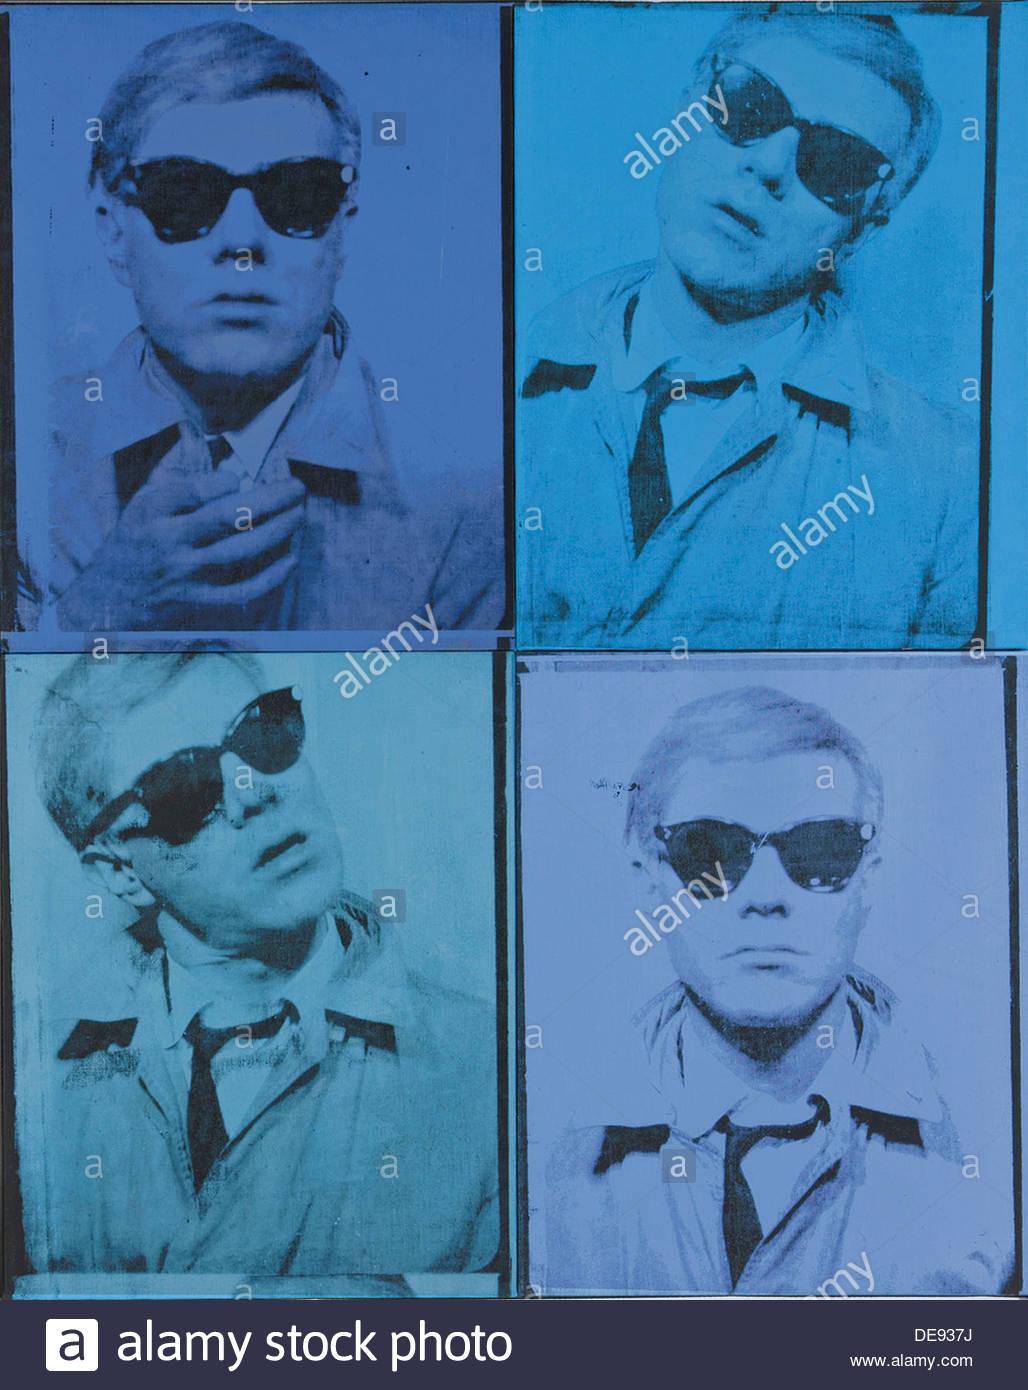 Self-Portrait, 1963-1964. Artist: Warhol, Andy (1928-1987) - Stock Image